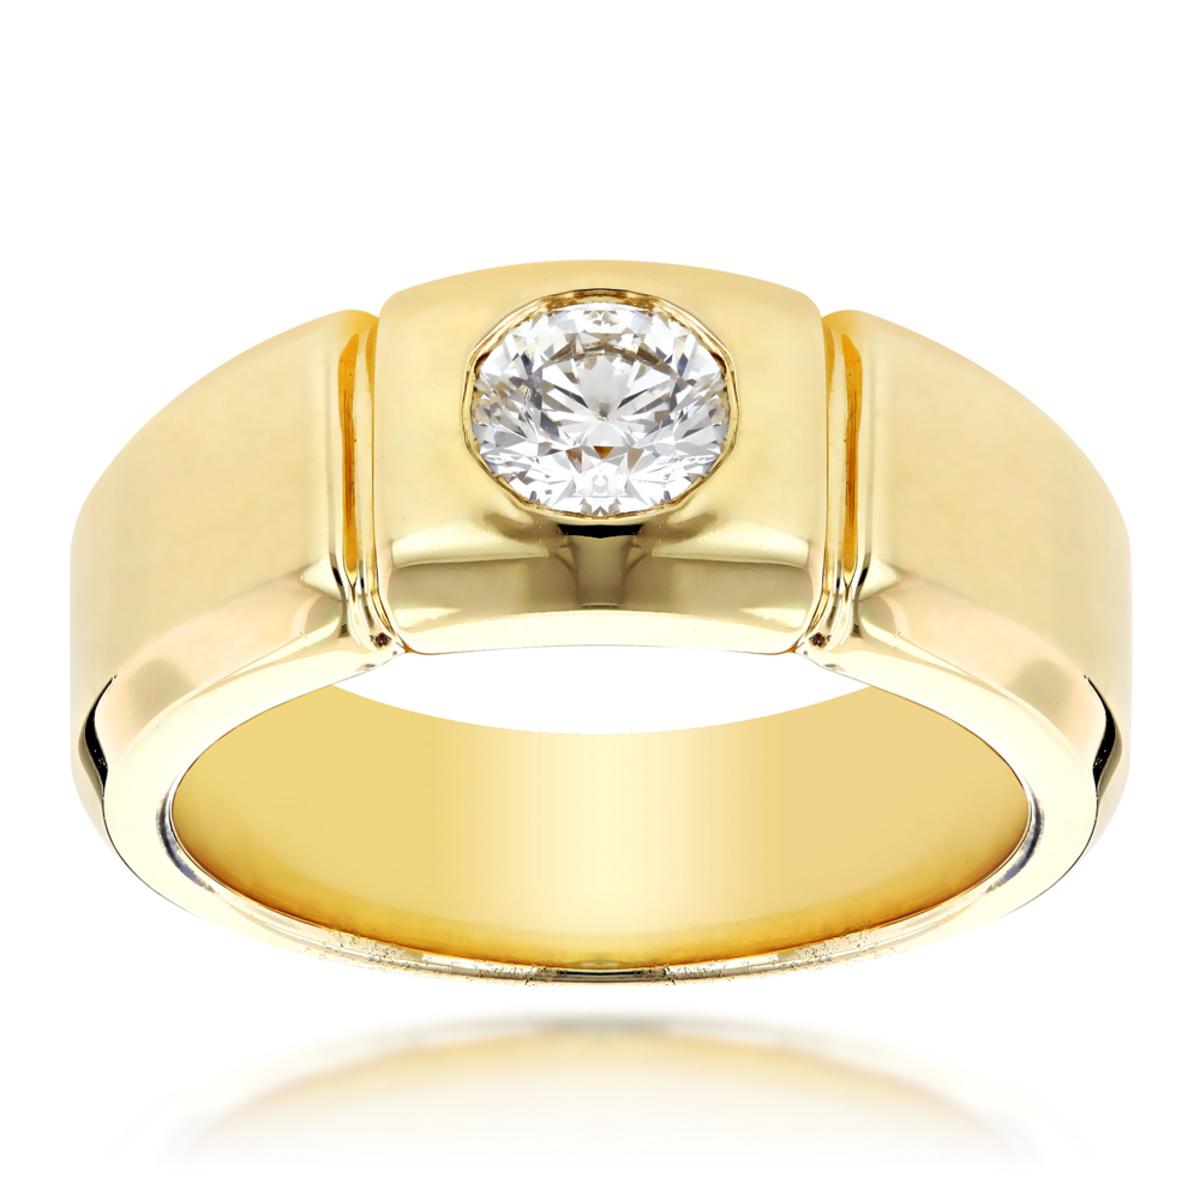 14K Gold Designer Mens Diamond Wedding Ring 0.5ct